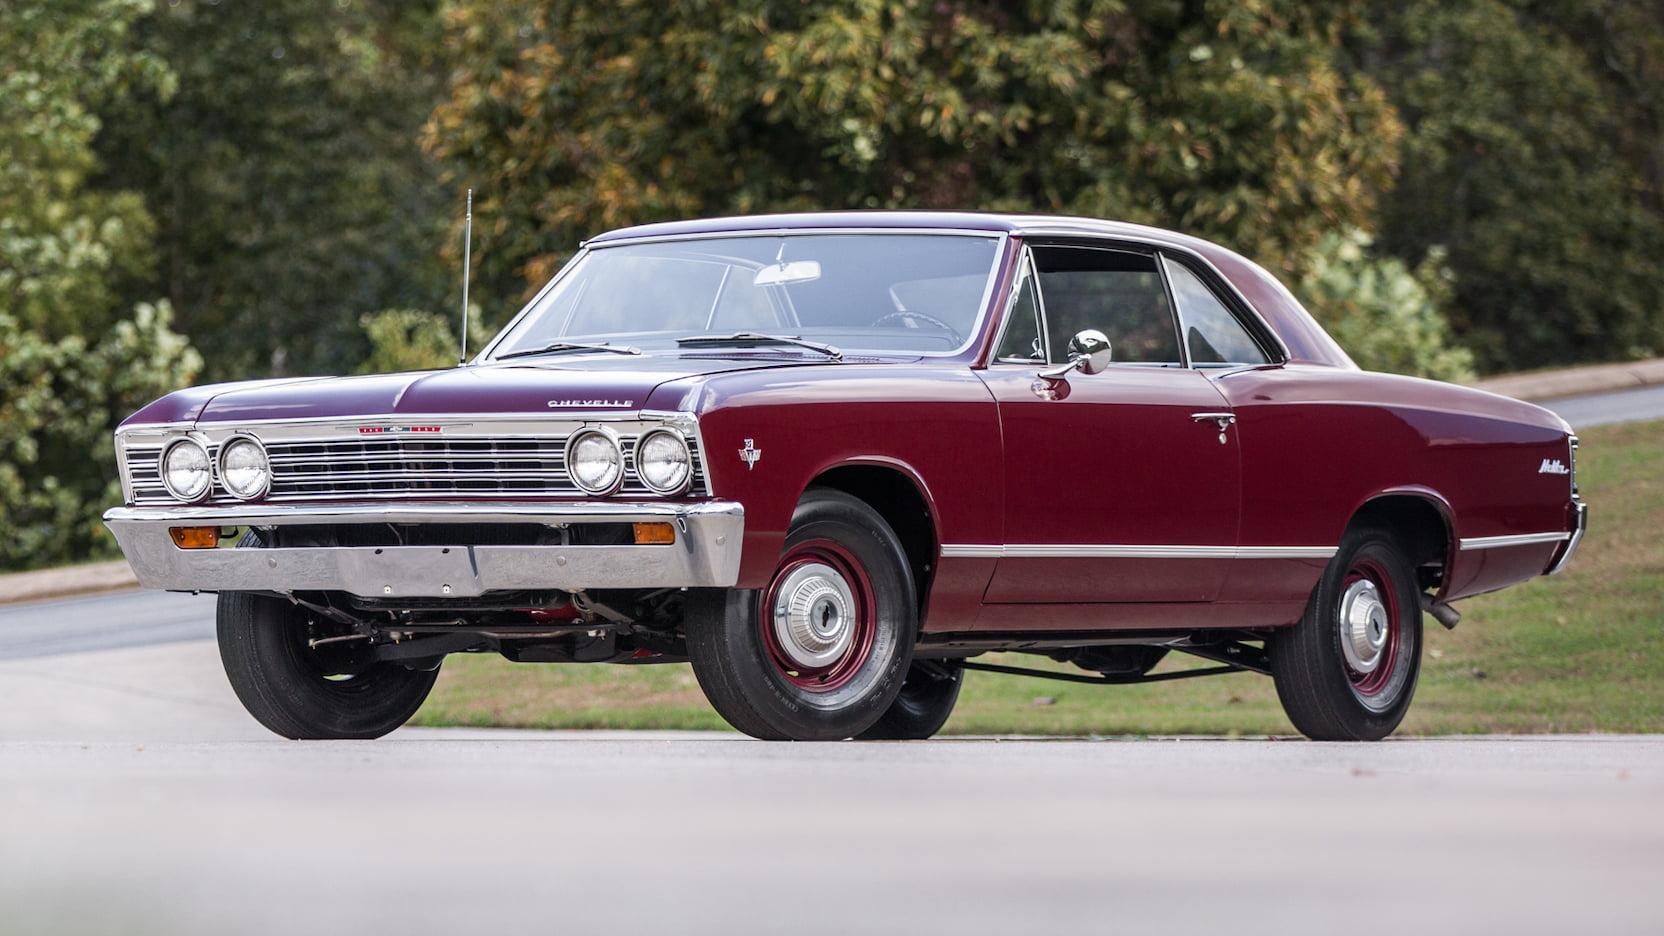 1966 Chevrolet Chevelle Malibu front 3/4 l79